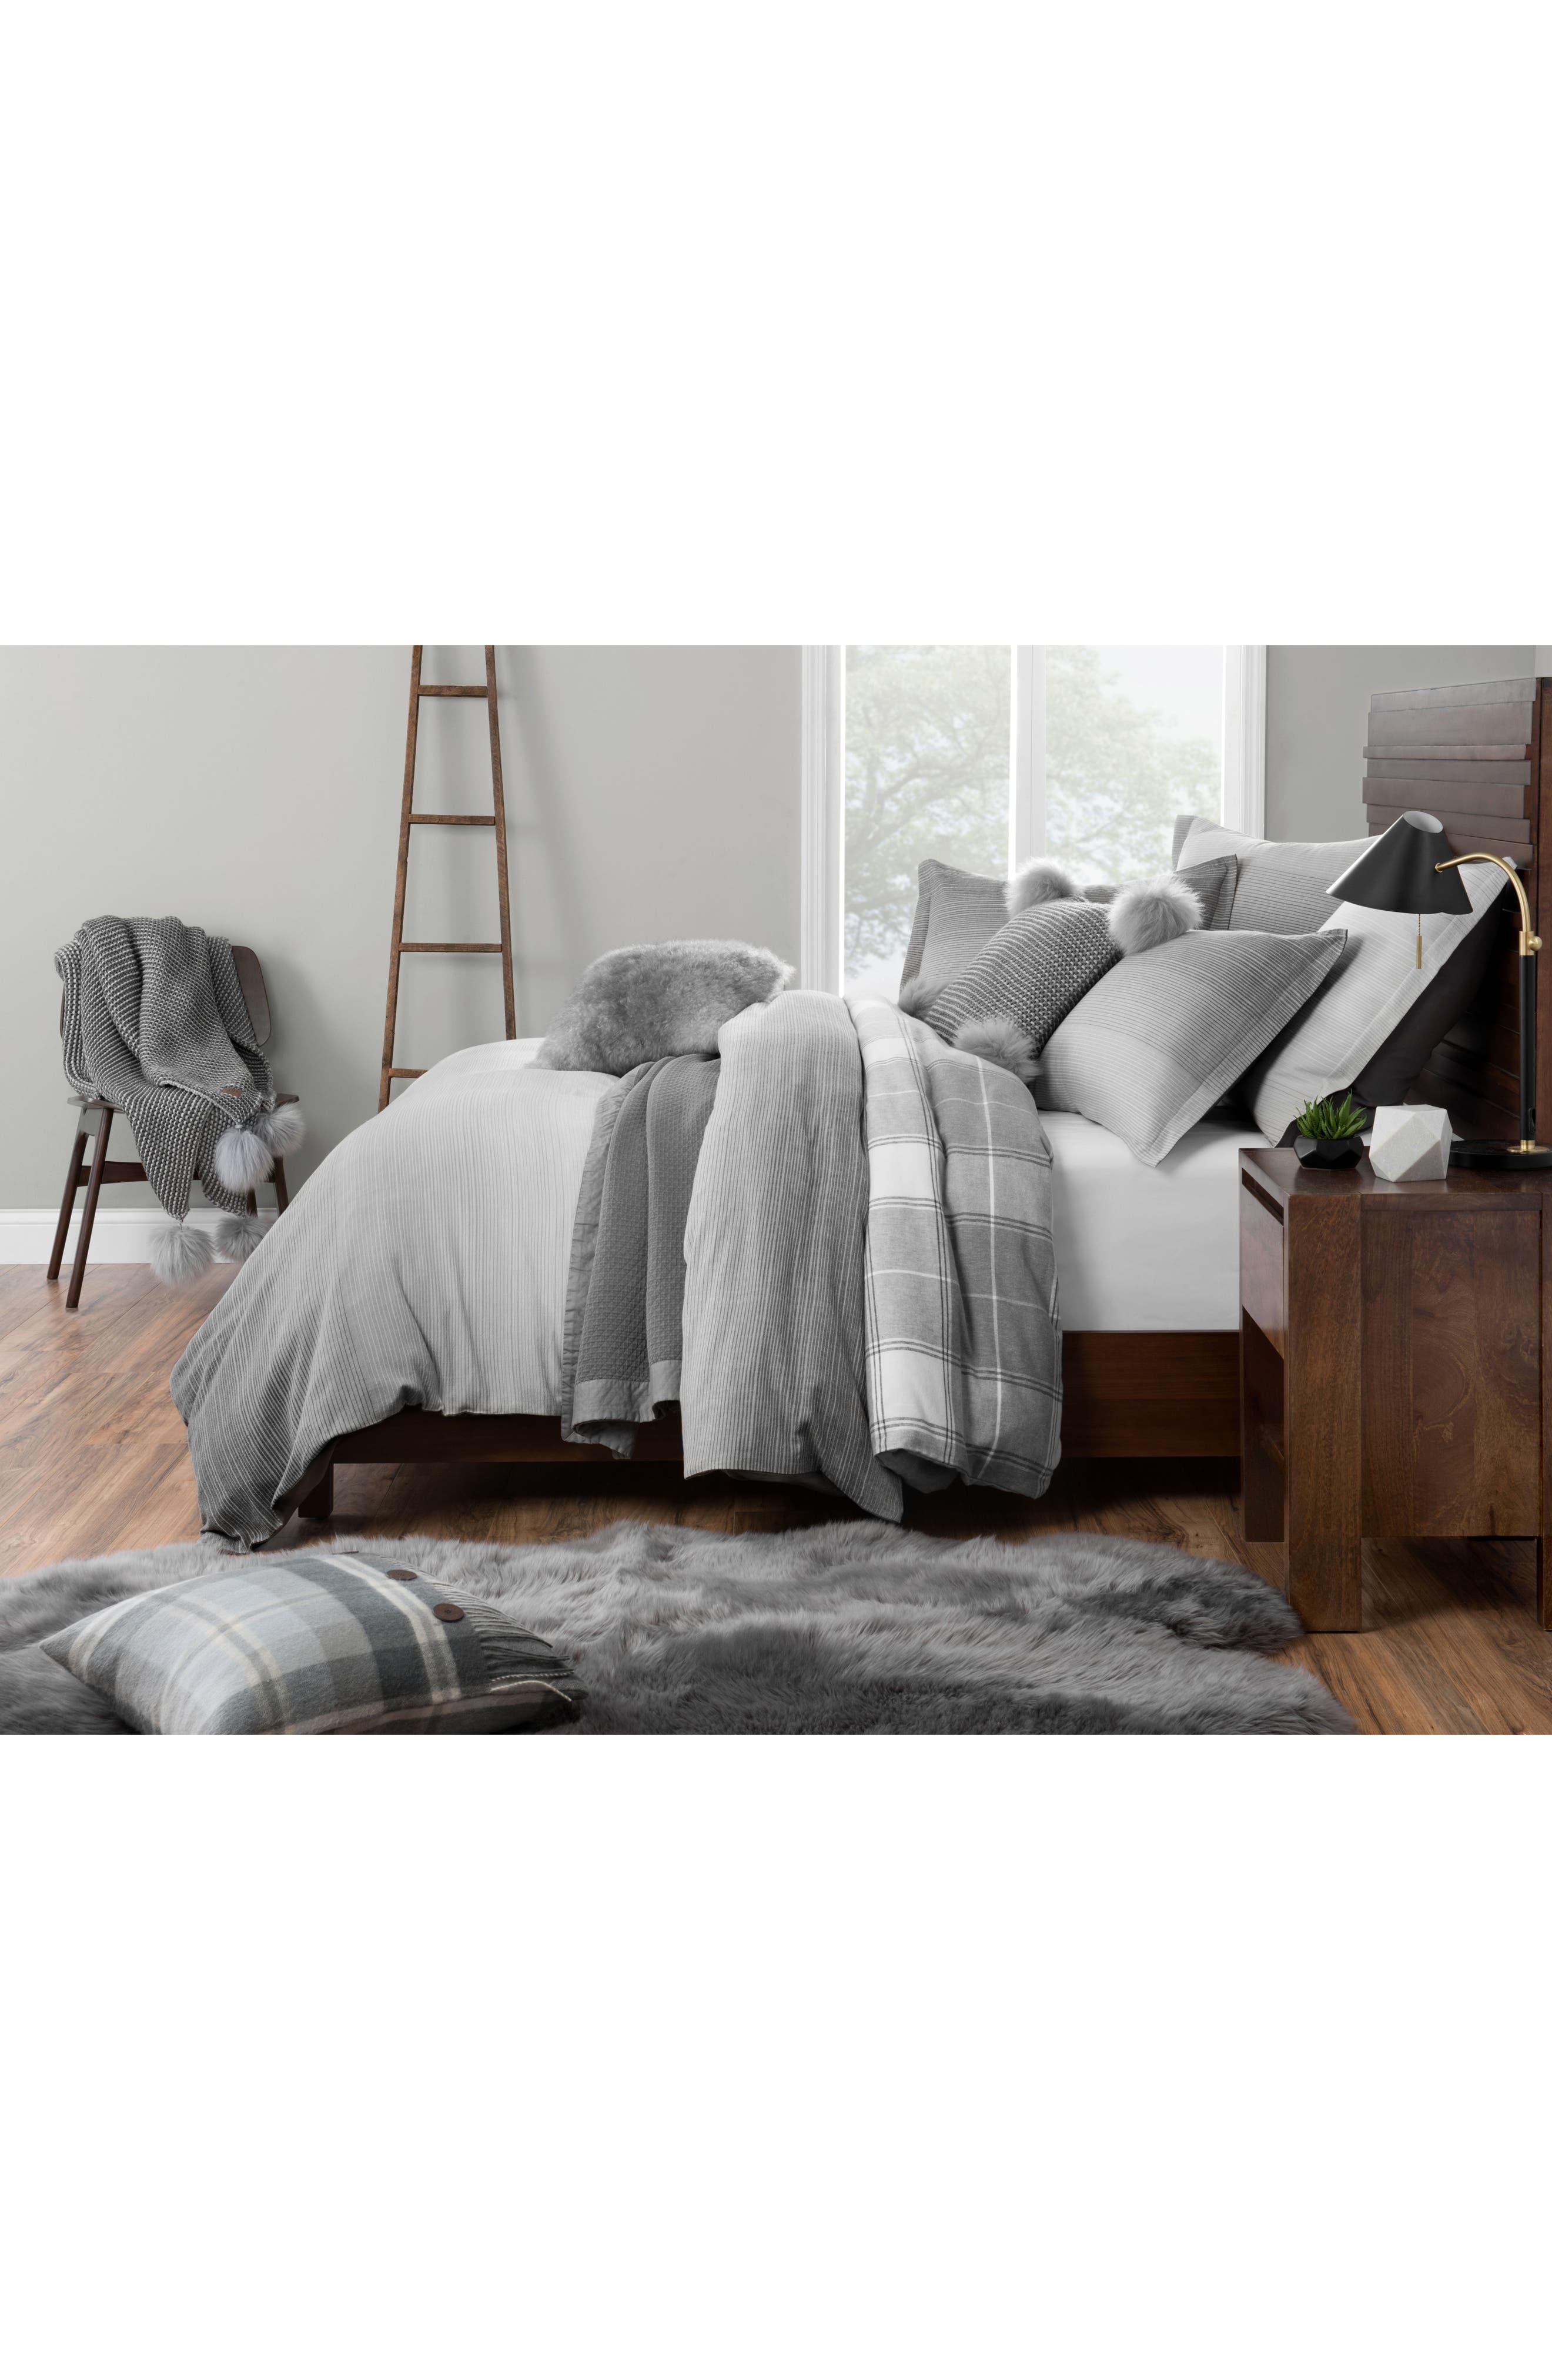 100 dark green bed linen bedroom casual picture of furniture for kid bedroom decoration - Green pixel bedding ...